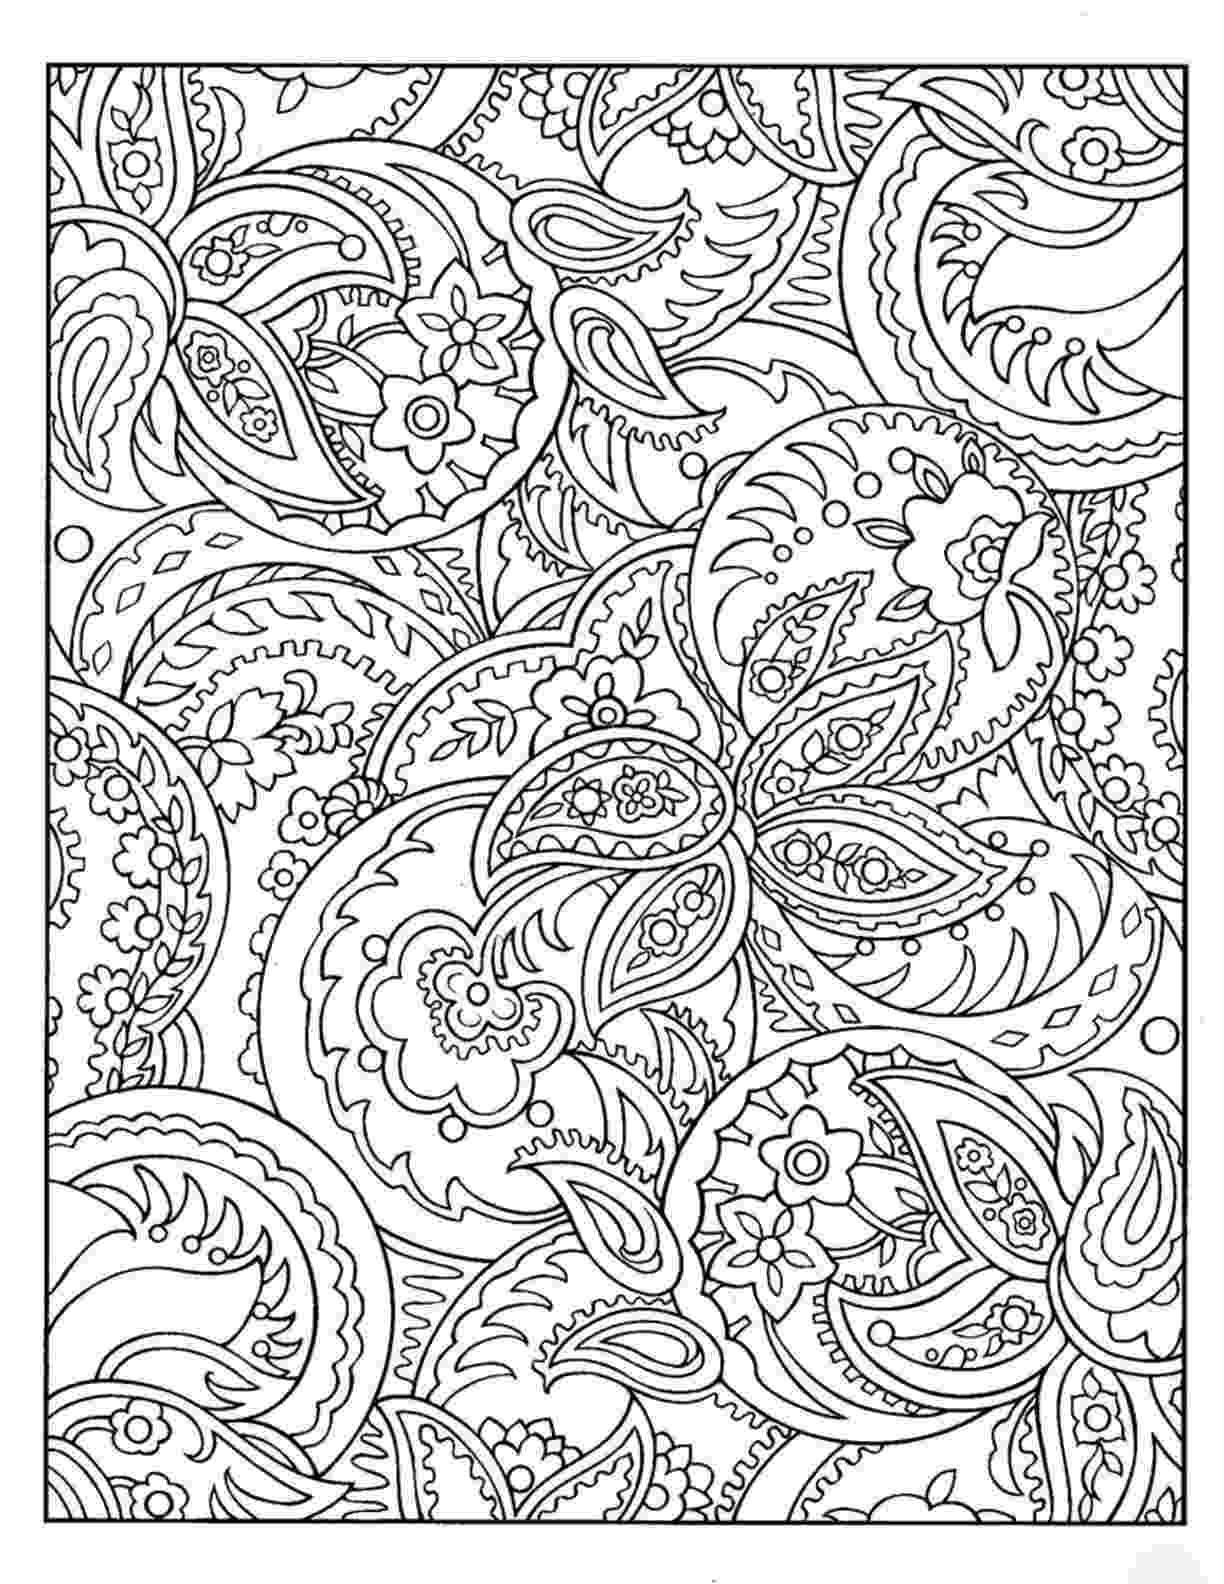 colouring sheets patterns pattern coloring pages best coloring pages for kids colouring patterns sheets 1 1